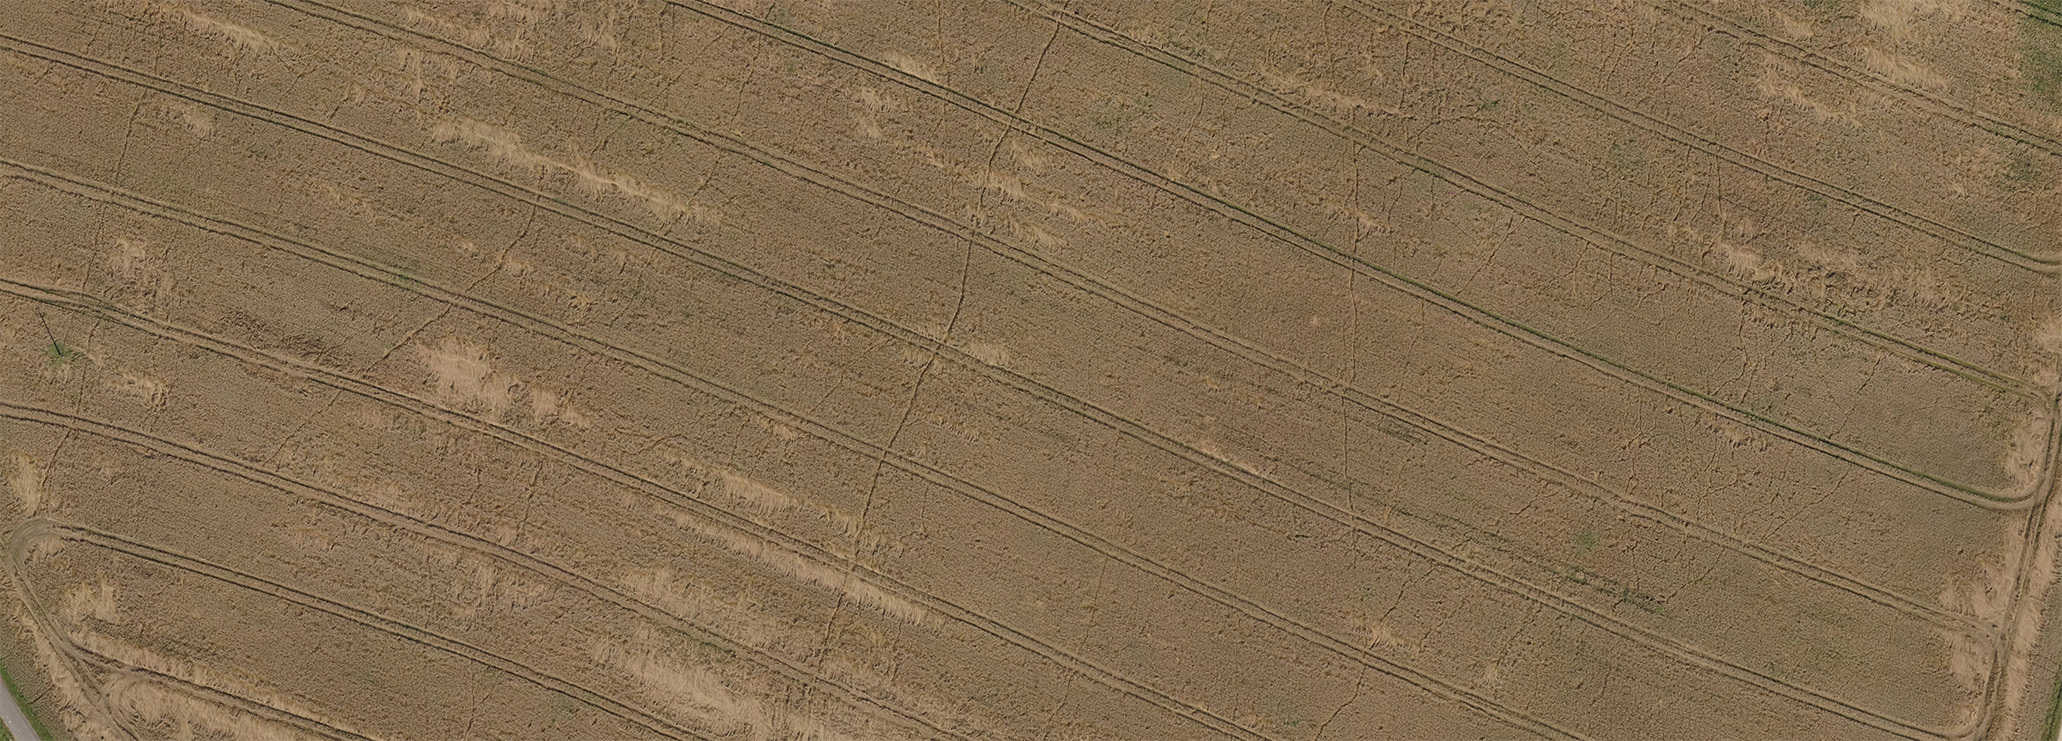 Ortofotomapa z drona - fragment pola